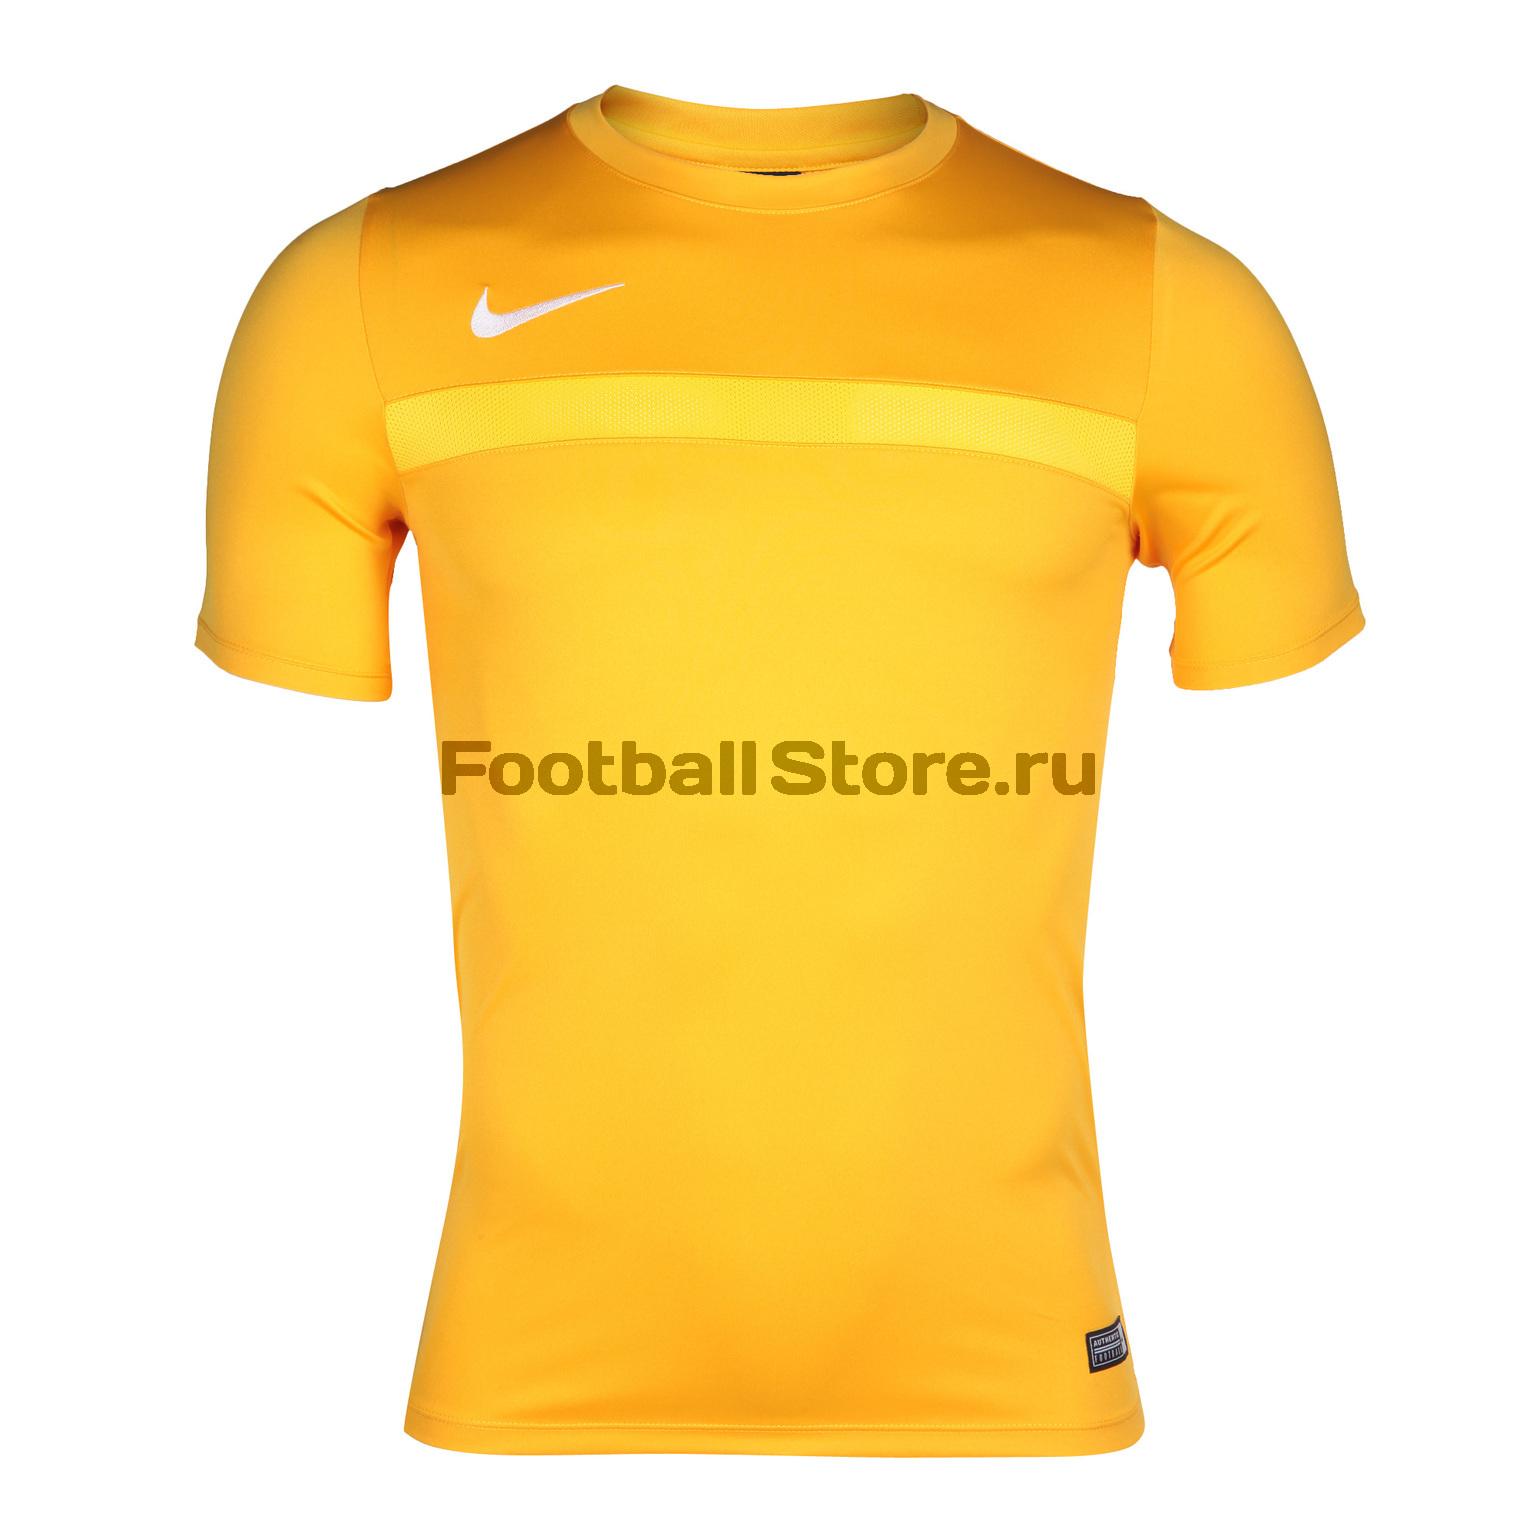 Футболка тренировочная Nike Academy 725932-739 куртка для костюма nike academy 14 sdln knit jkt 588470 739